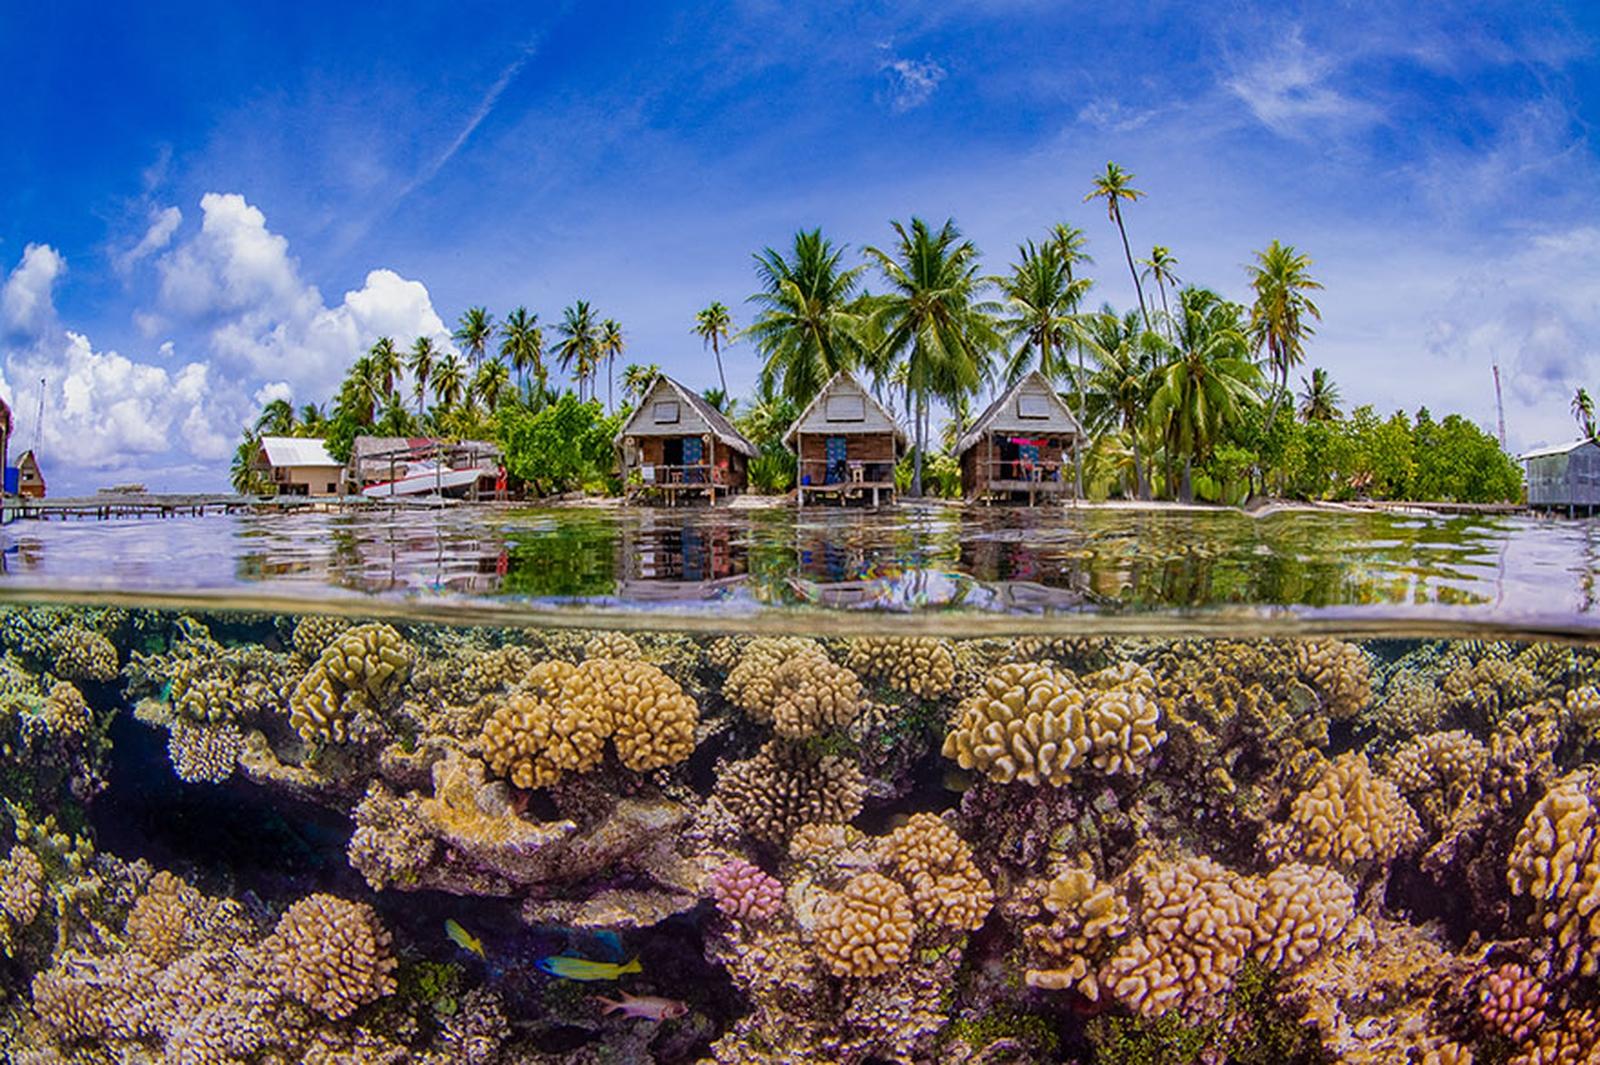 concours-2019-photo-sous-marine